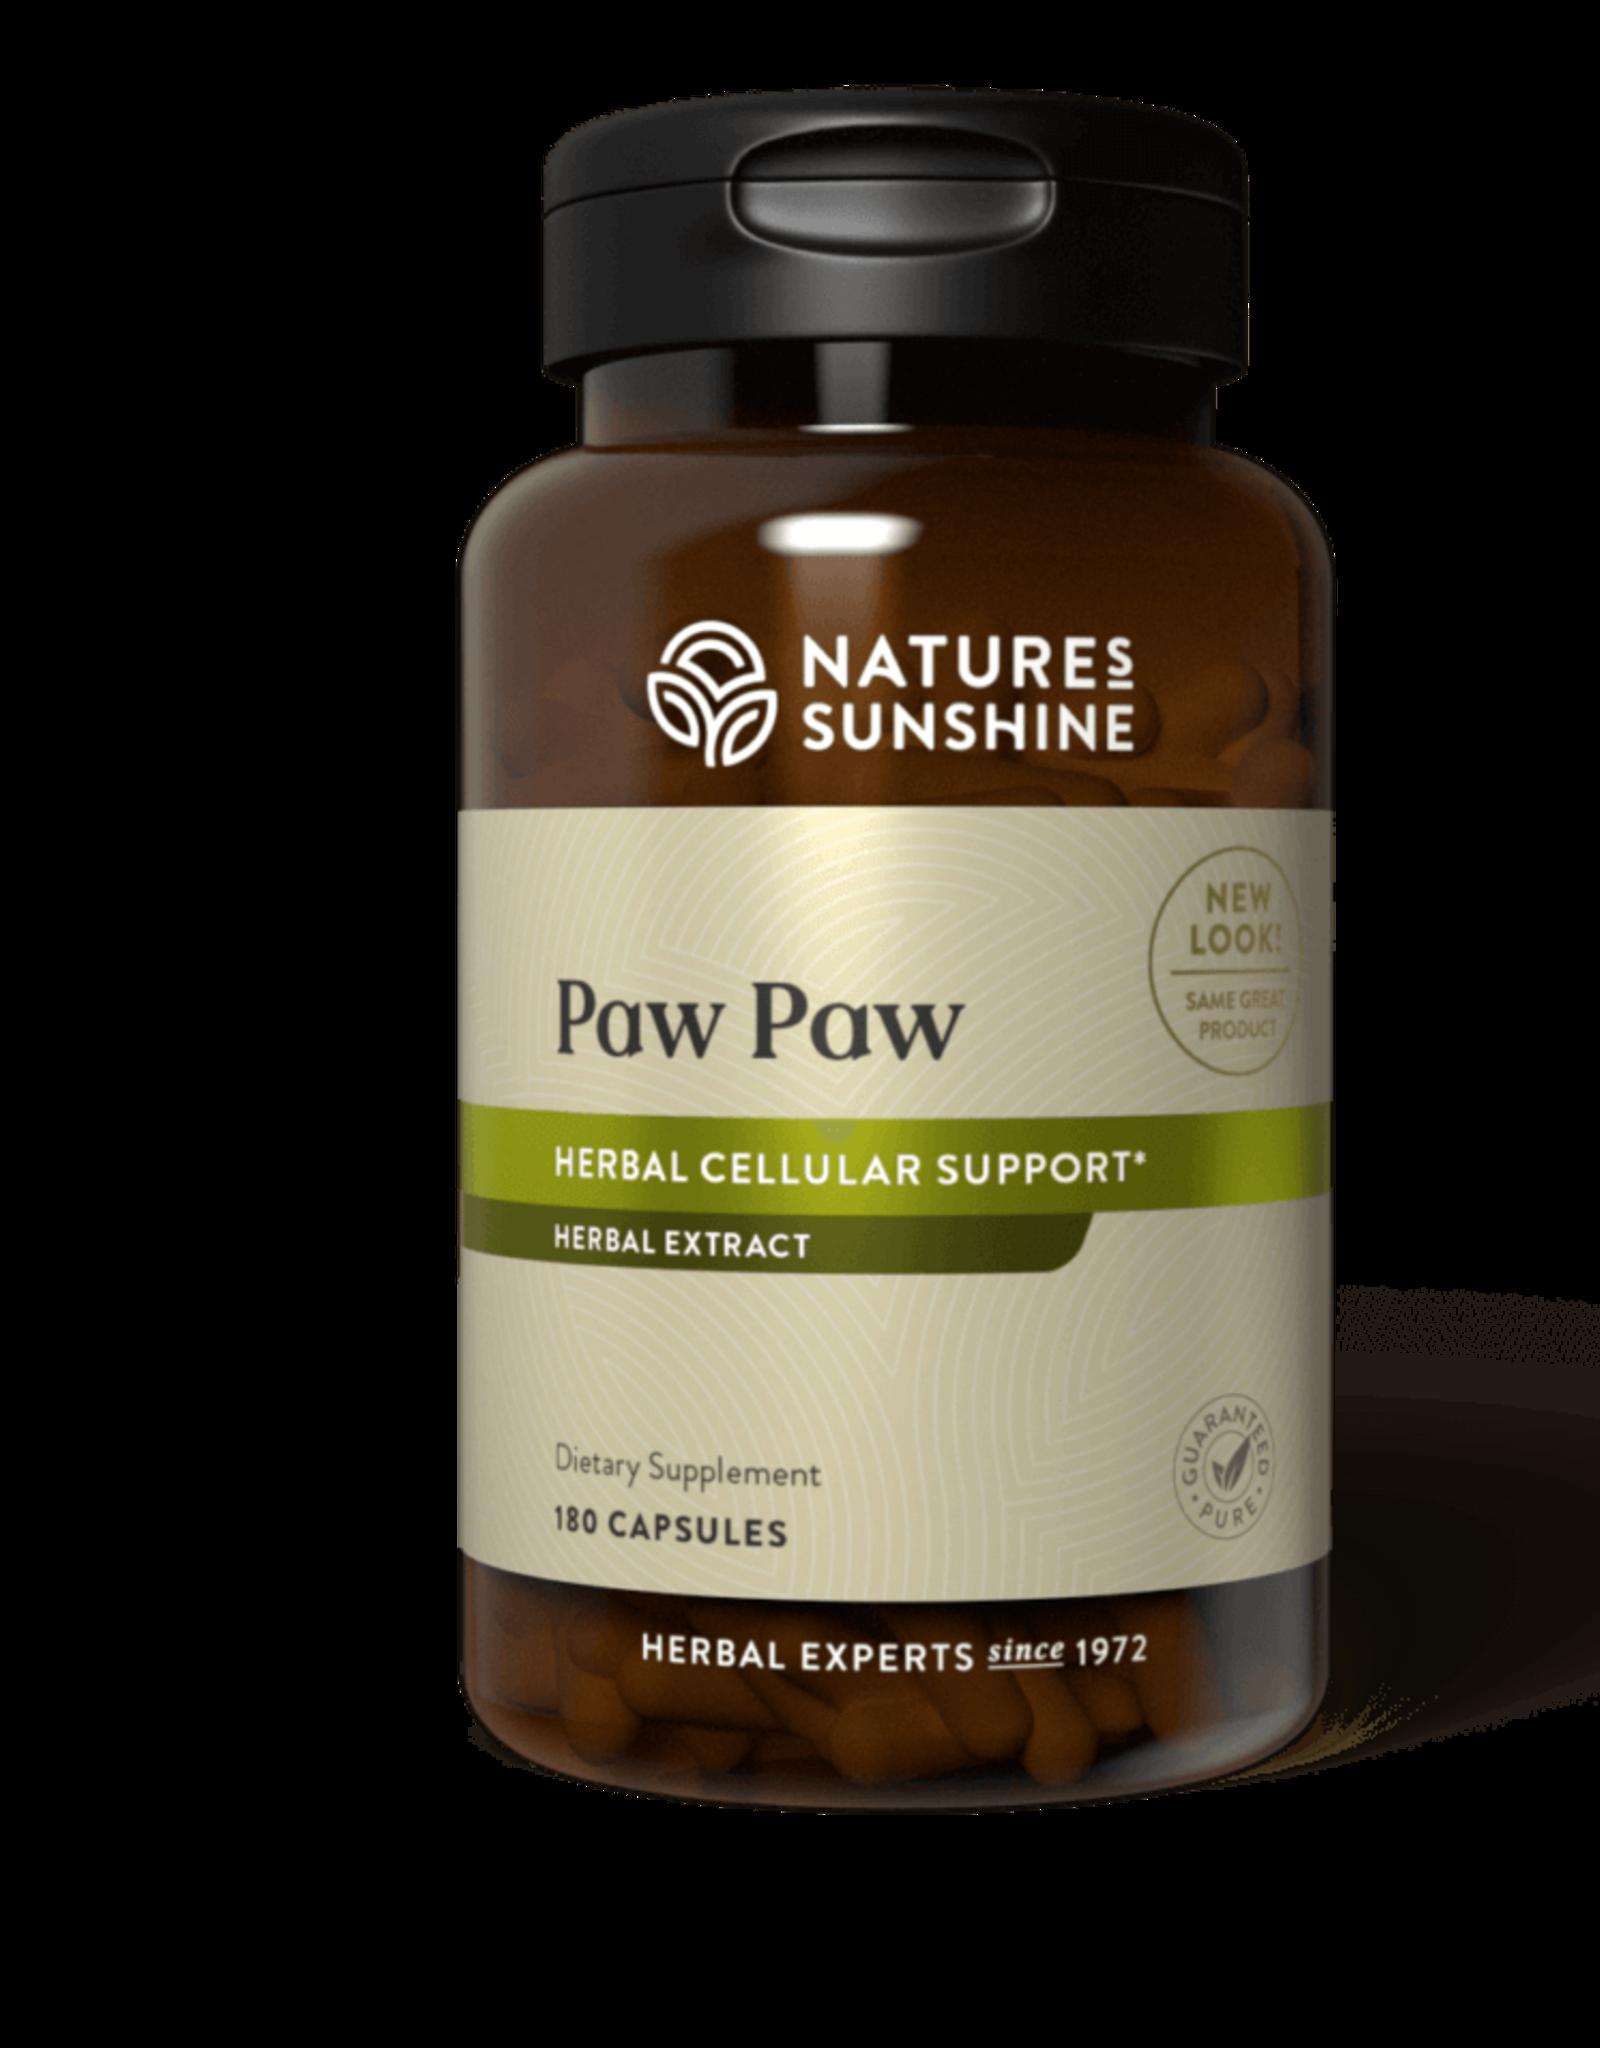 Nature's Sunshine Paw Paw Cell-Reg (180 caps) (ko)